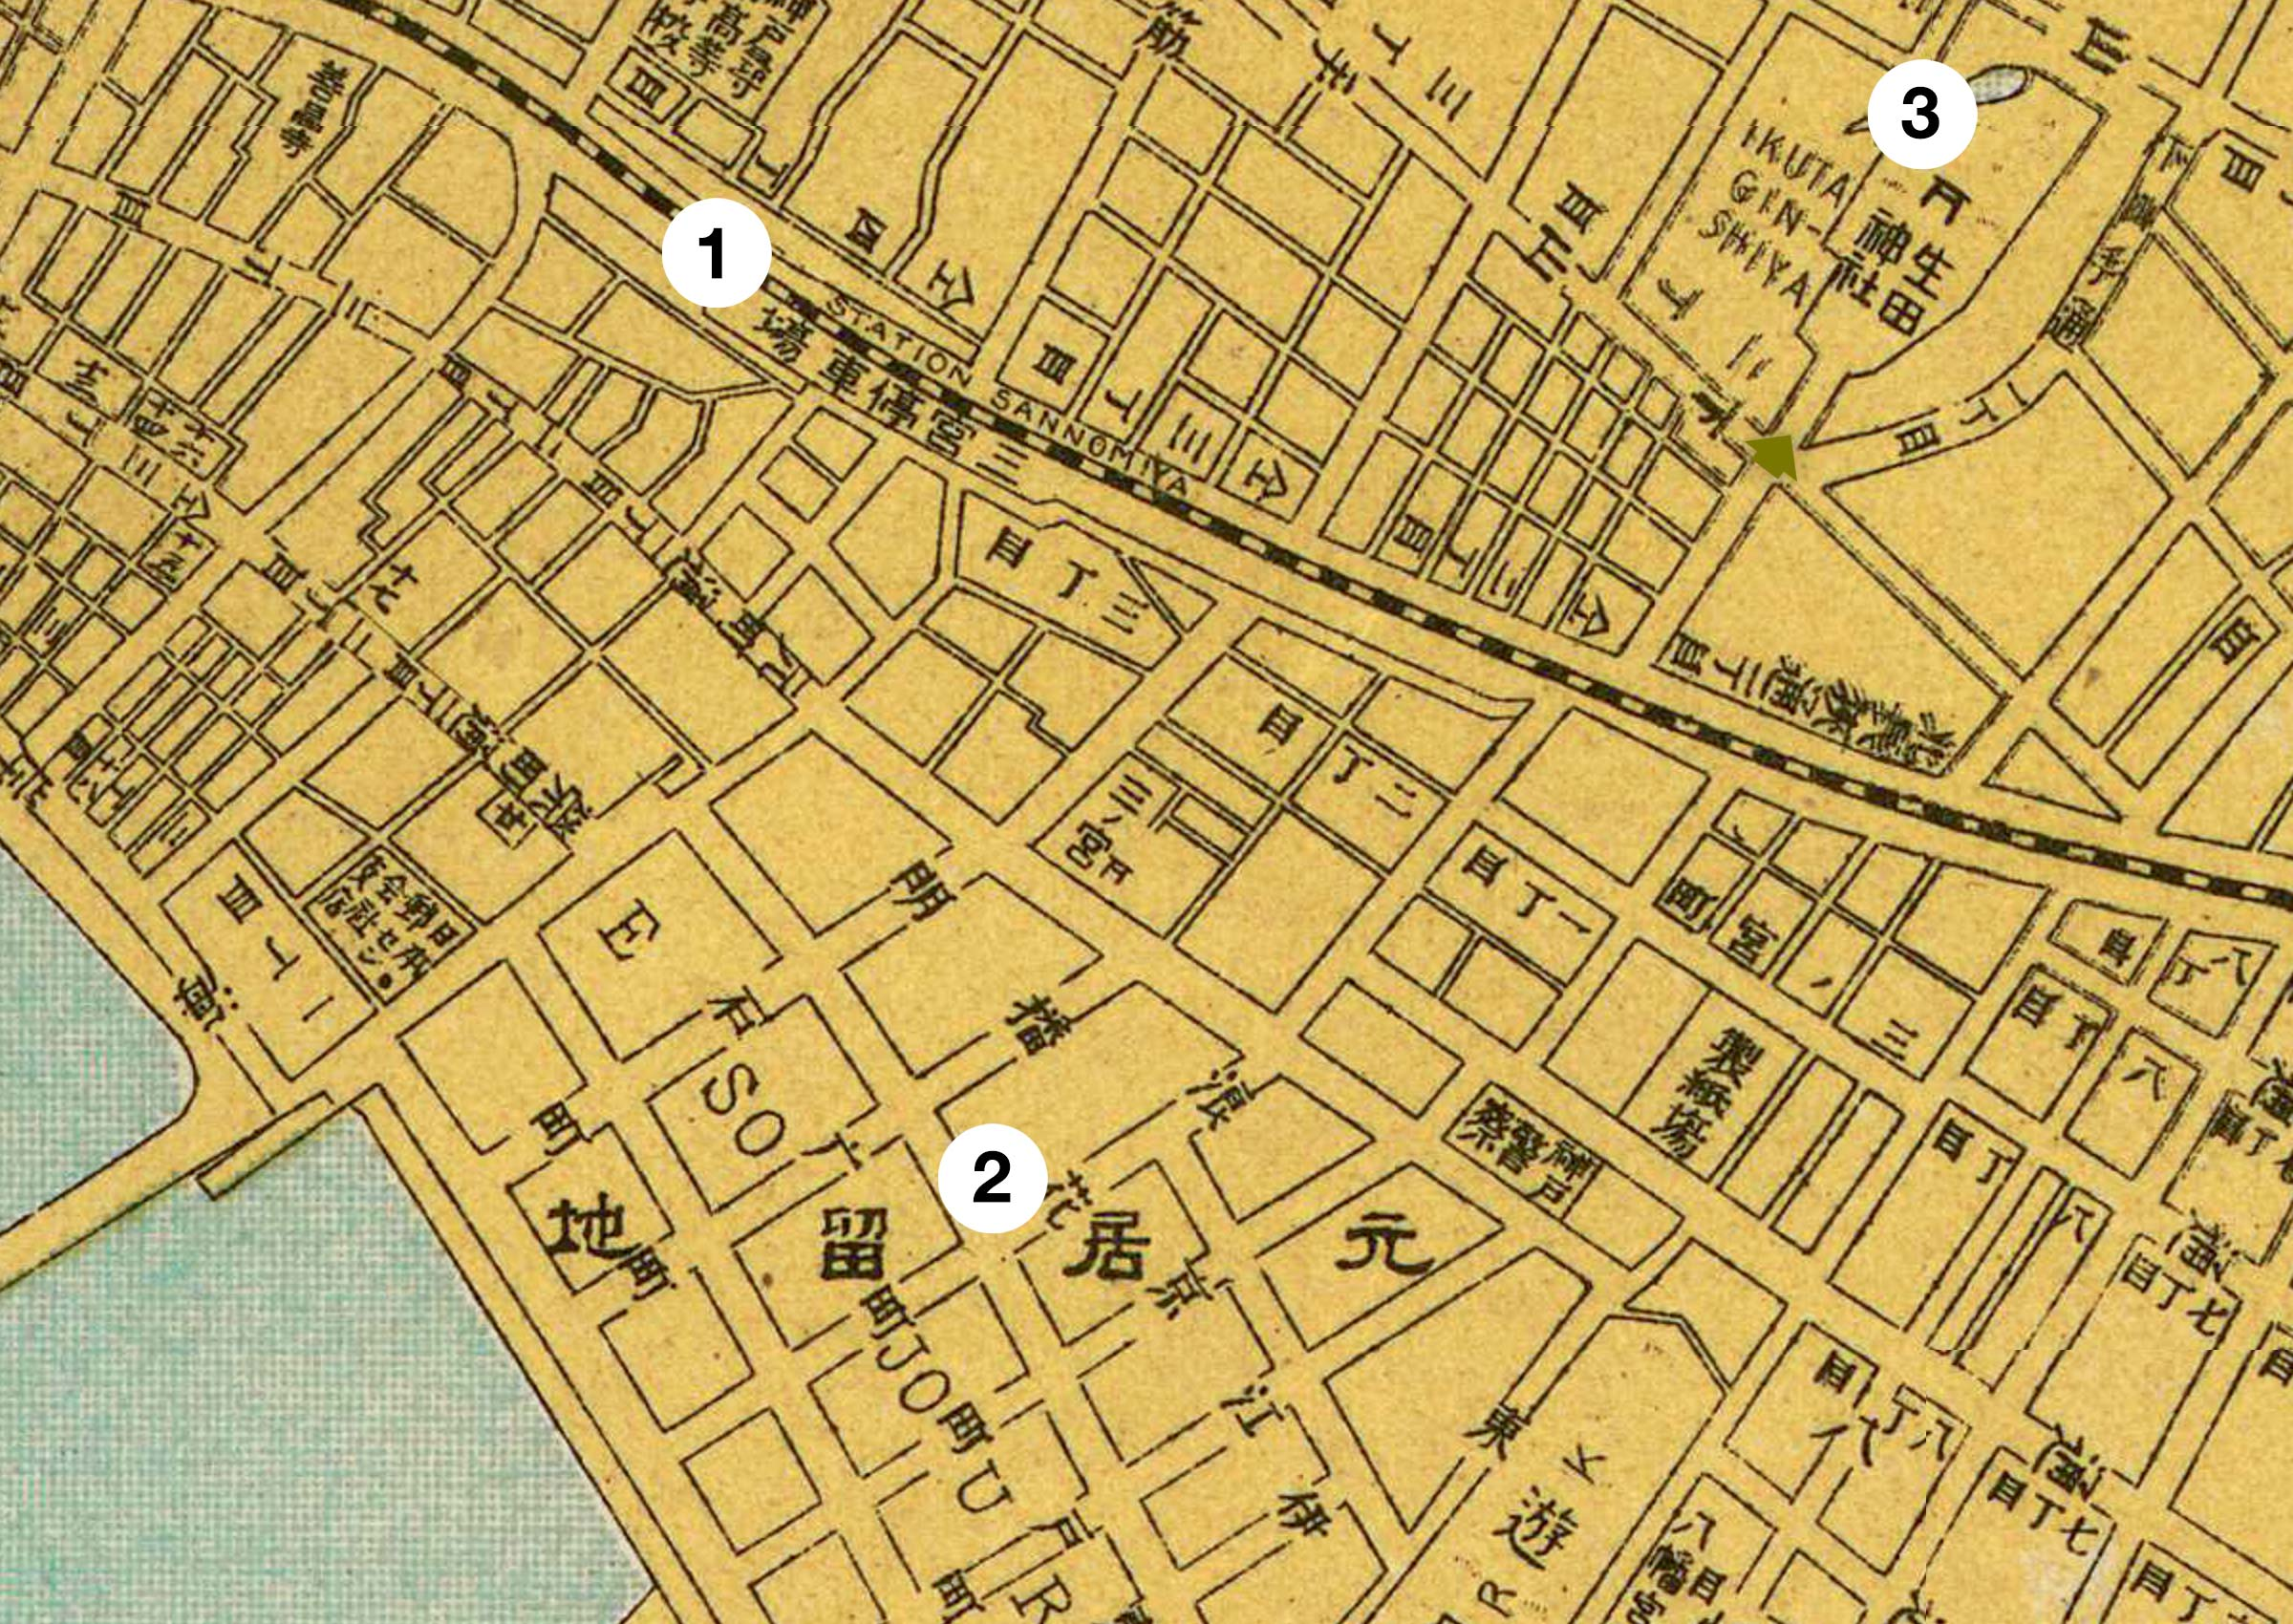 1891 Map of Kobe